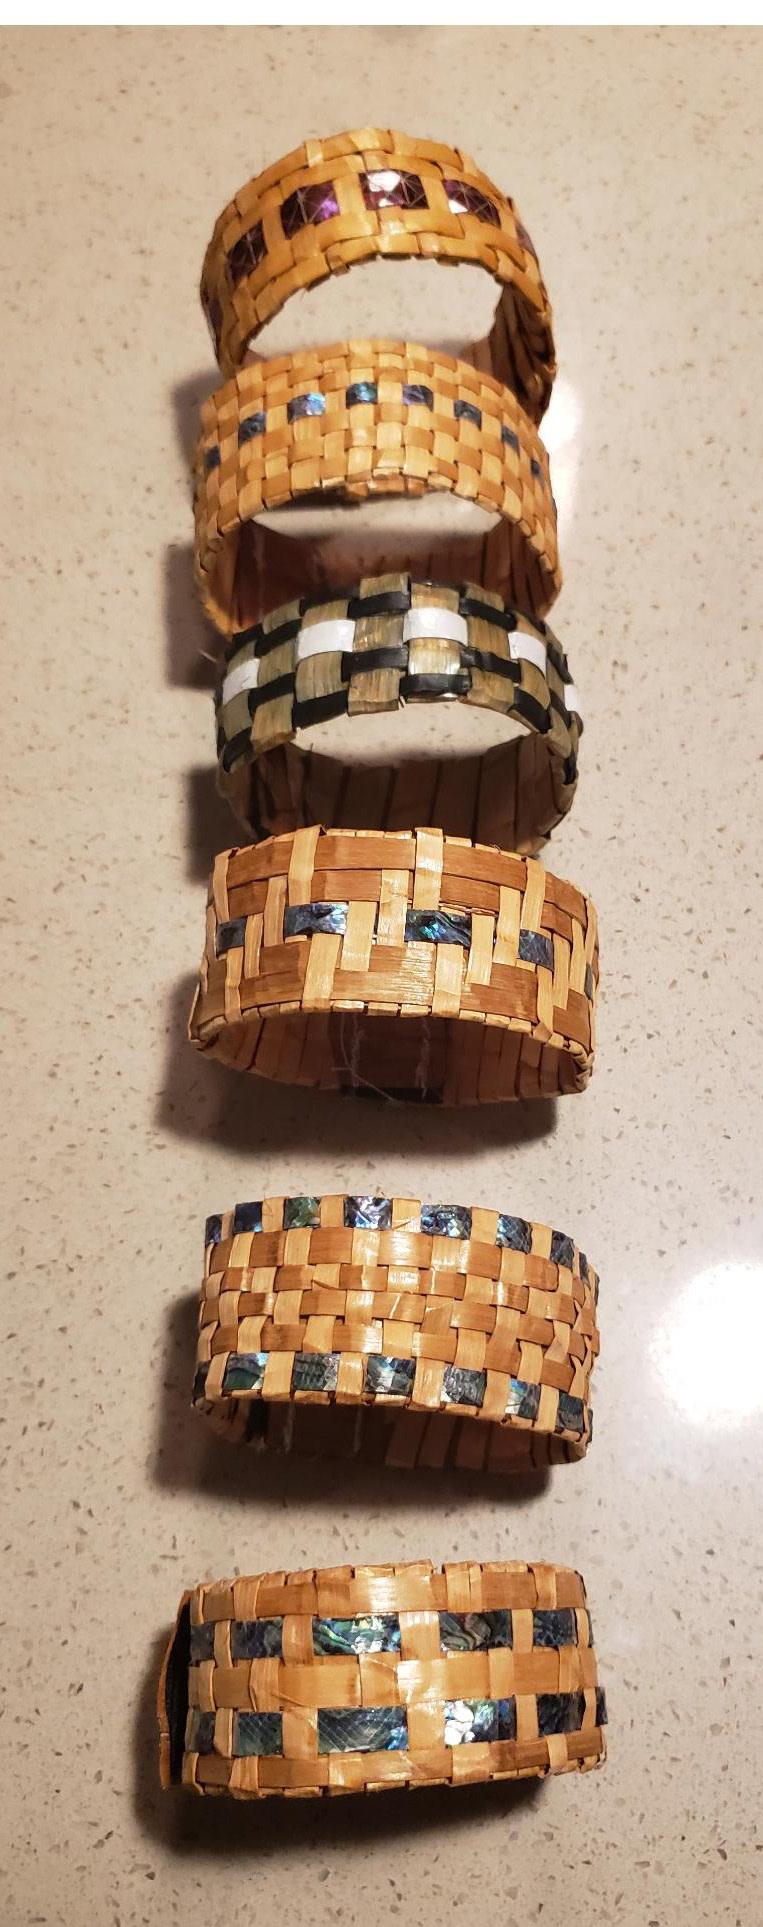 Cedar Bracelet with Abalone inlay- by C. Chapman-2